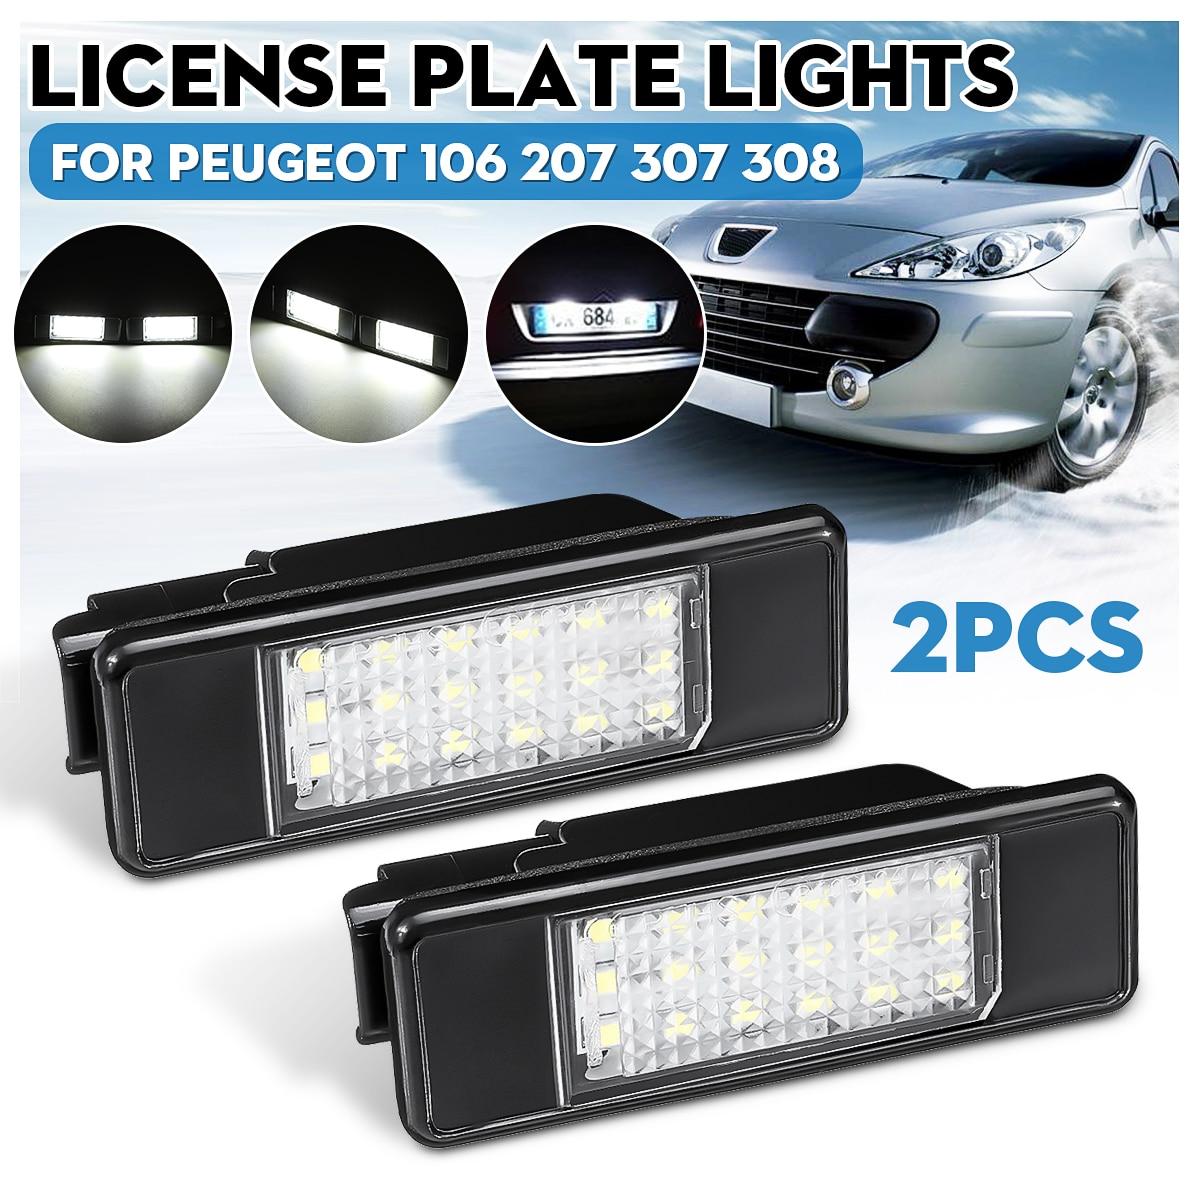 2x Peugeot Licence Number Plate LED Light White 106 207 307 308 406 407 508 RCZ